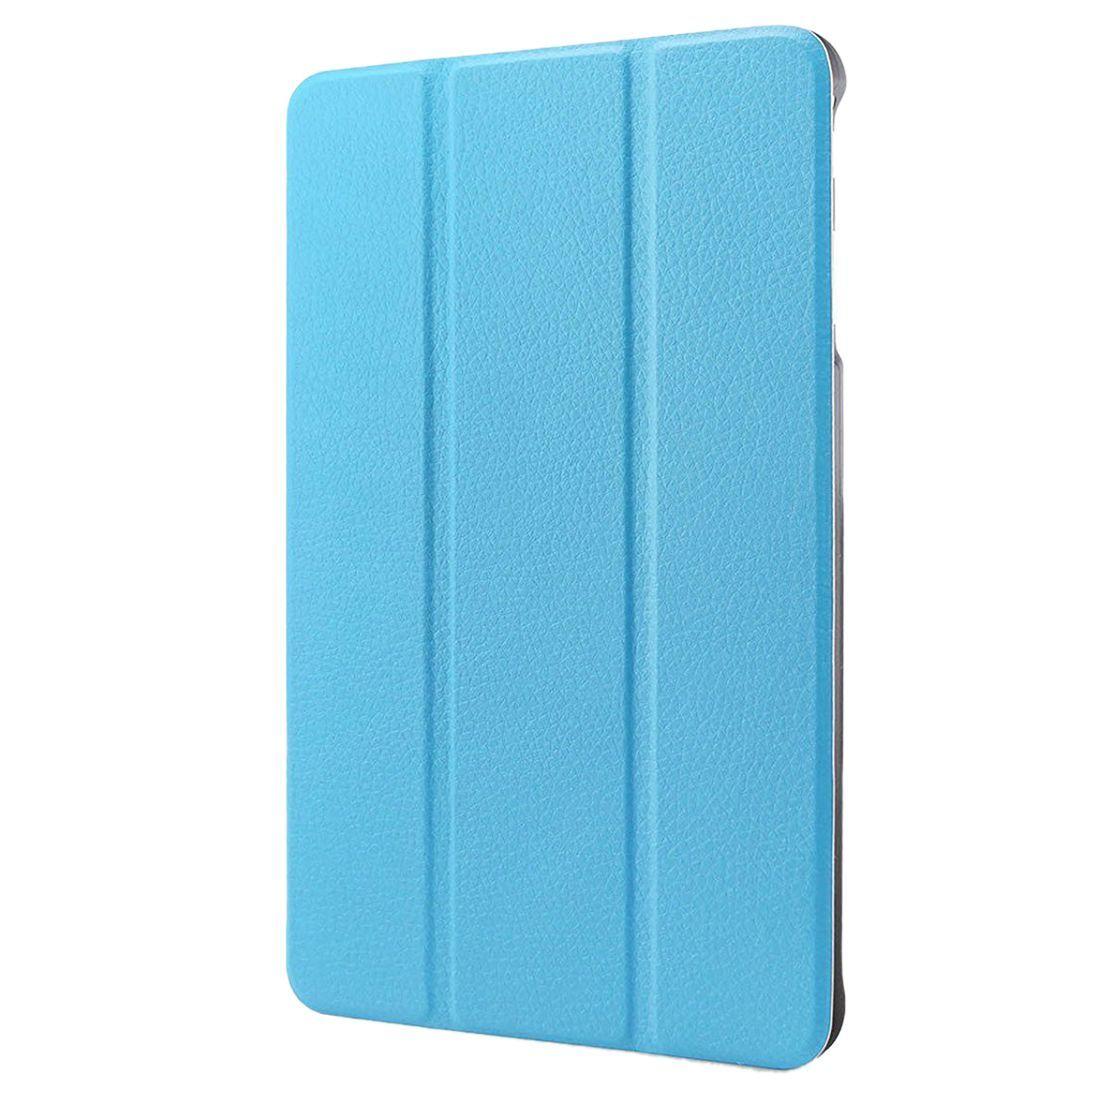 Slim Smart Cover Case for Samsung Galaxy Tab E 9.6-Inch (Blue) #Affiliate